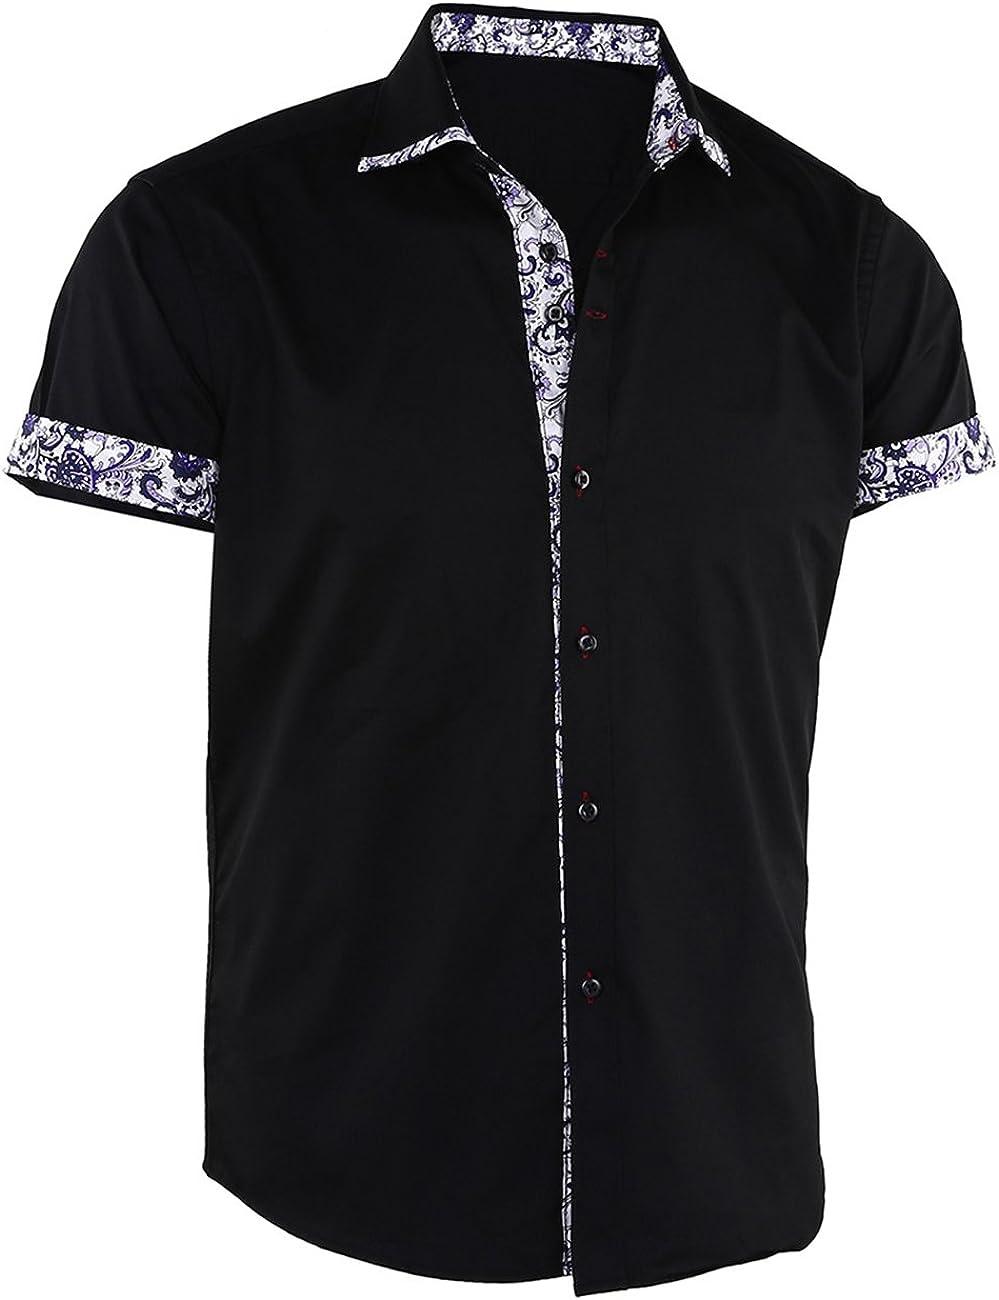 Dioufond Mens Dress Shirts Short Sleeve Button Down Shirts for Men